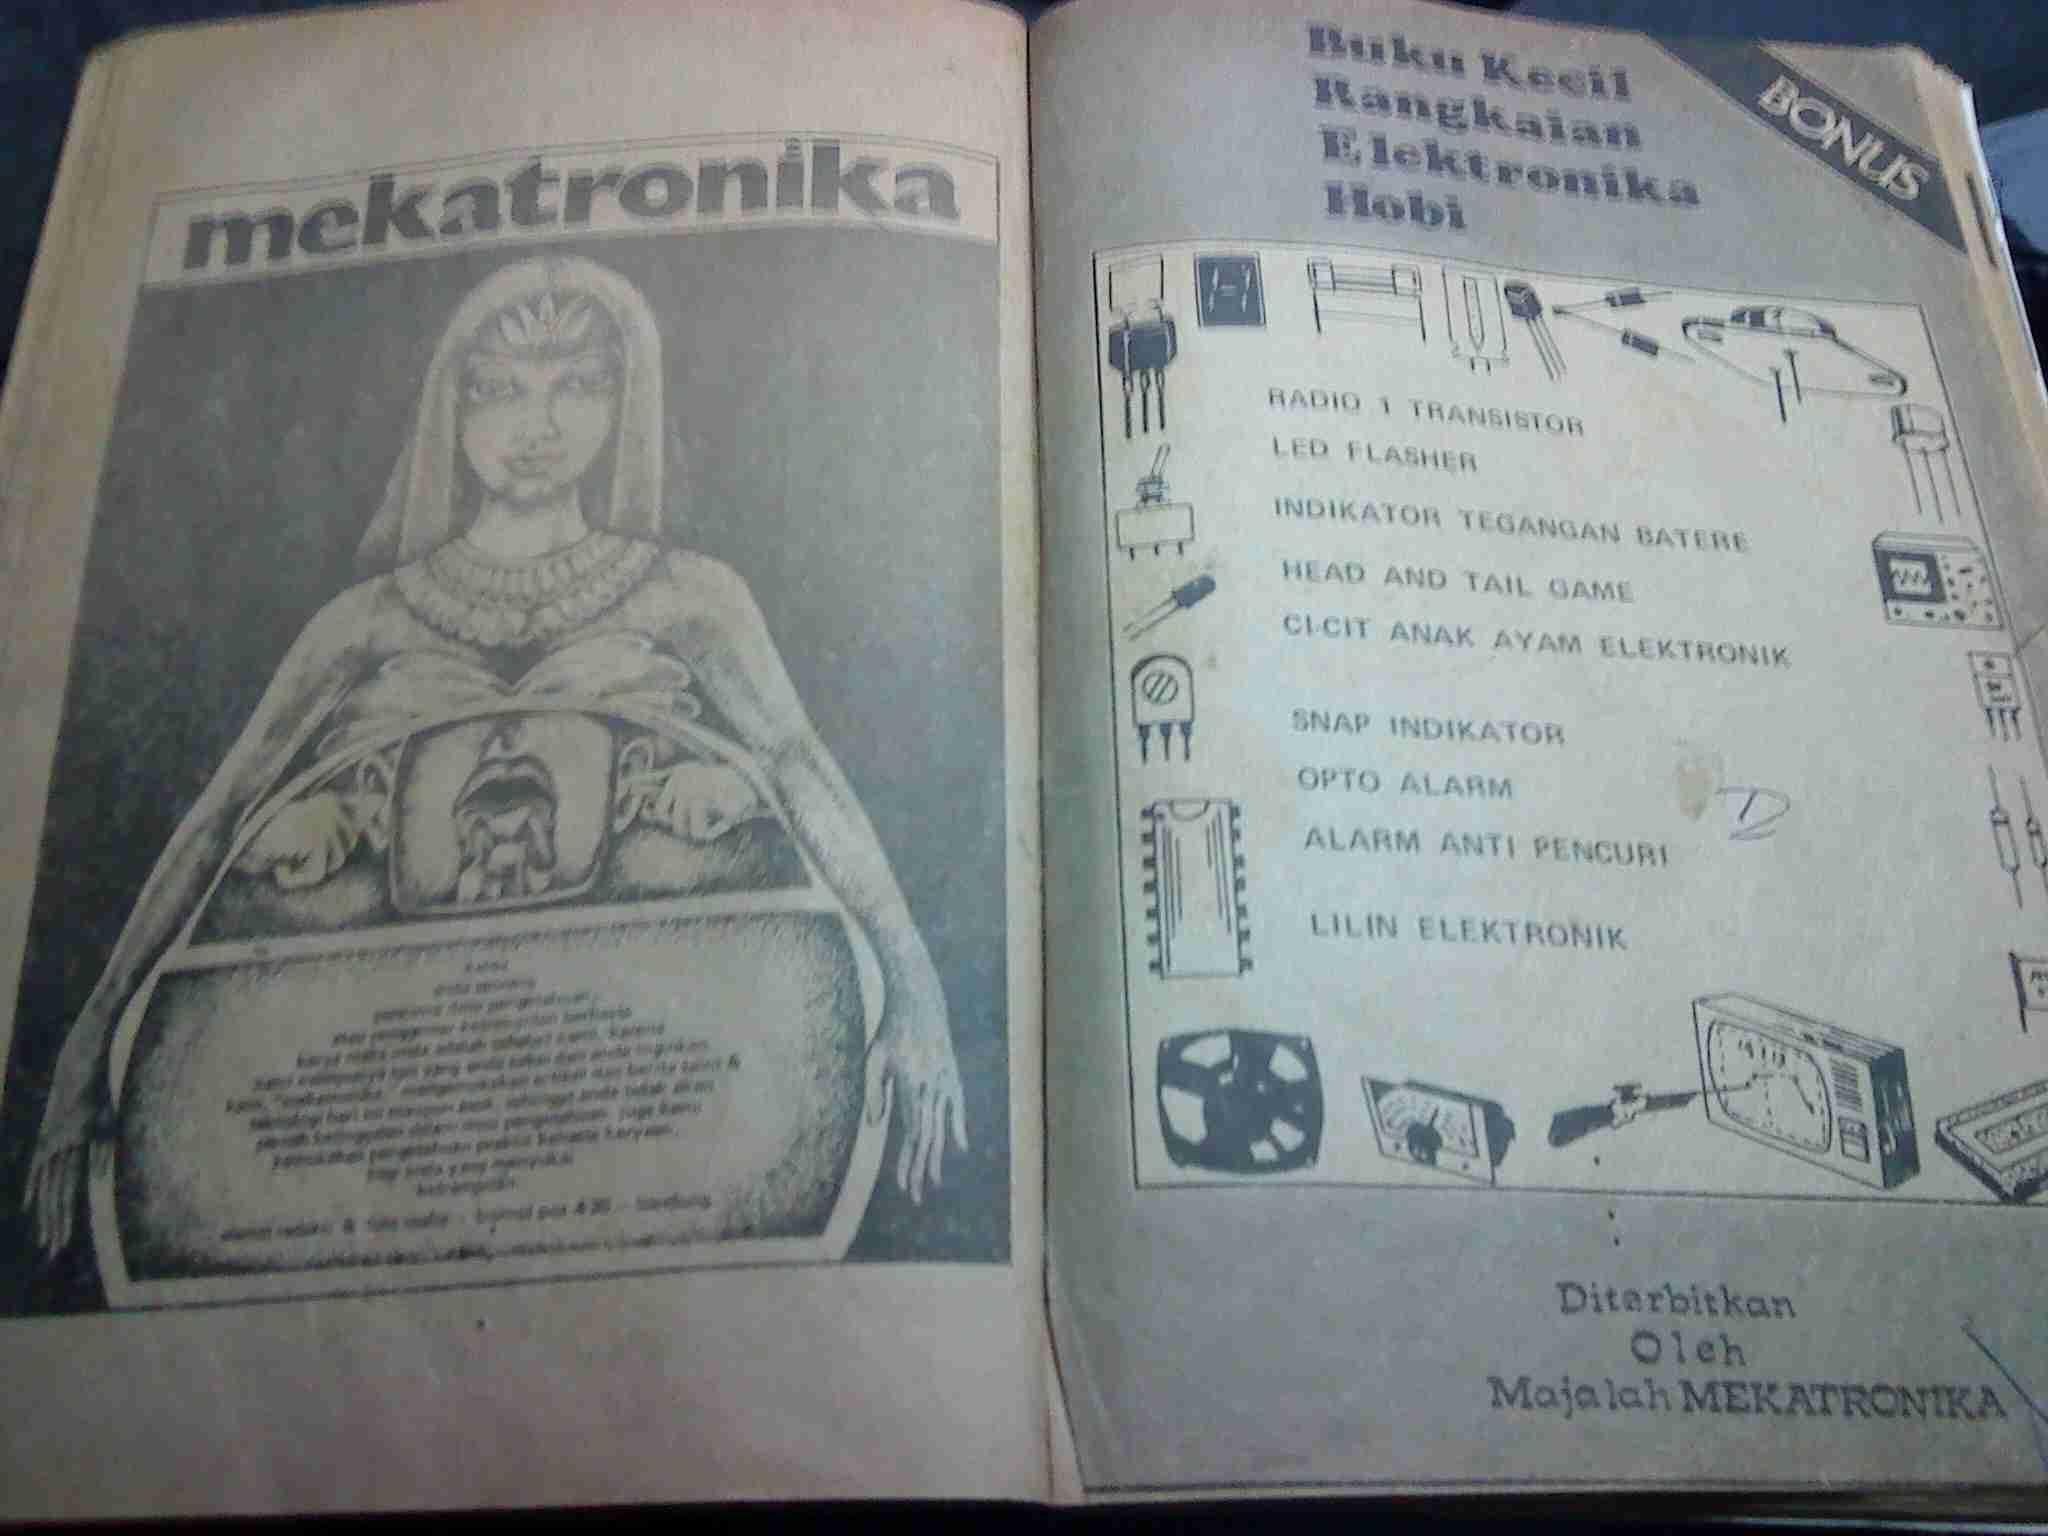 Bundel bonus Mekatronika, majalah elektronika jadul